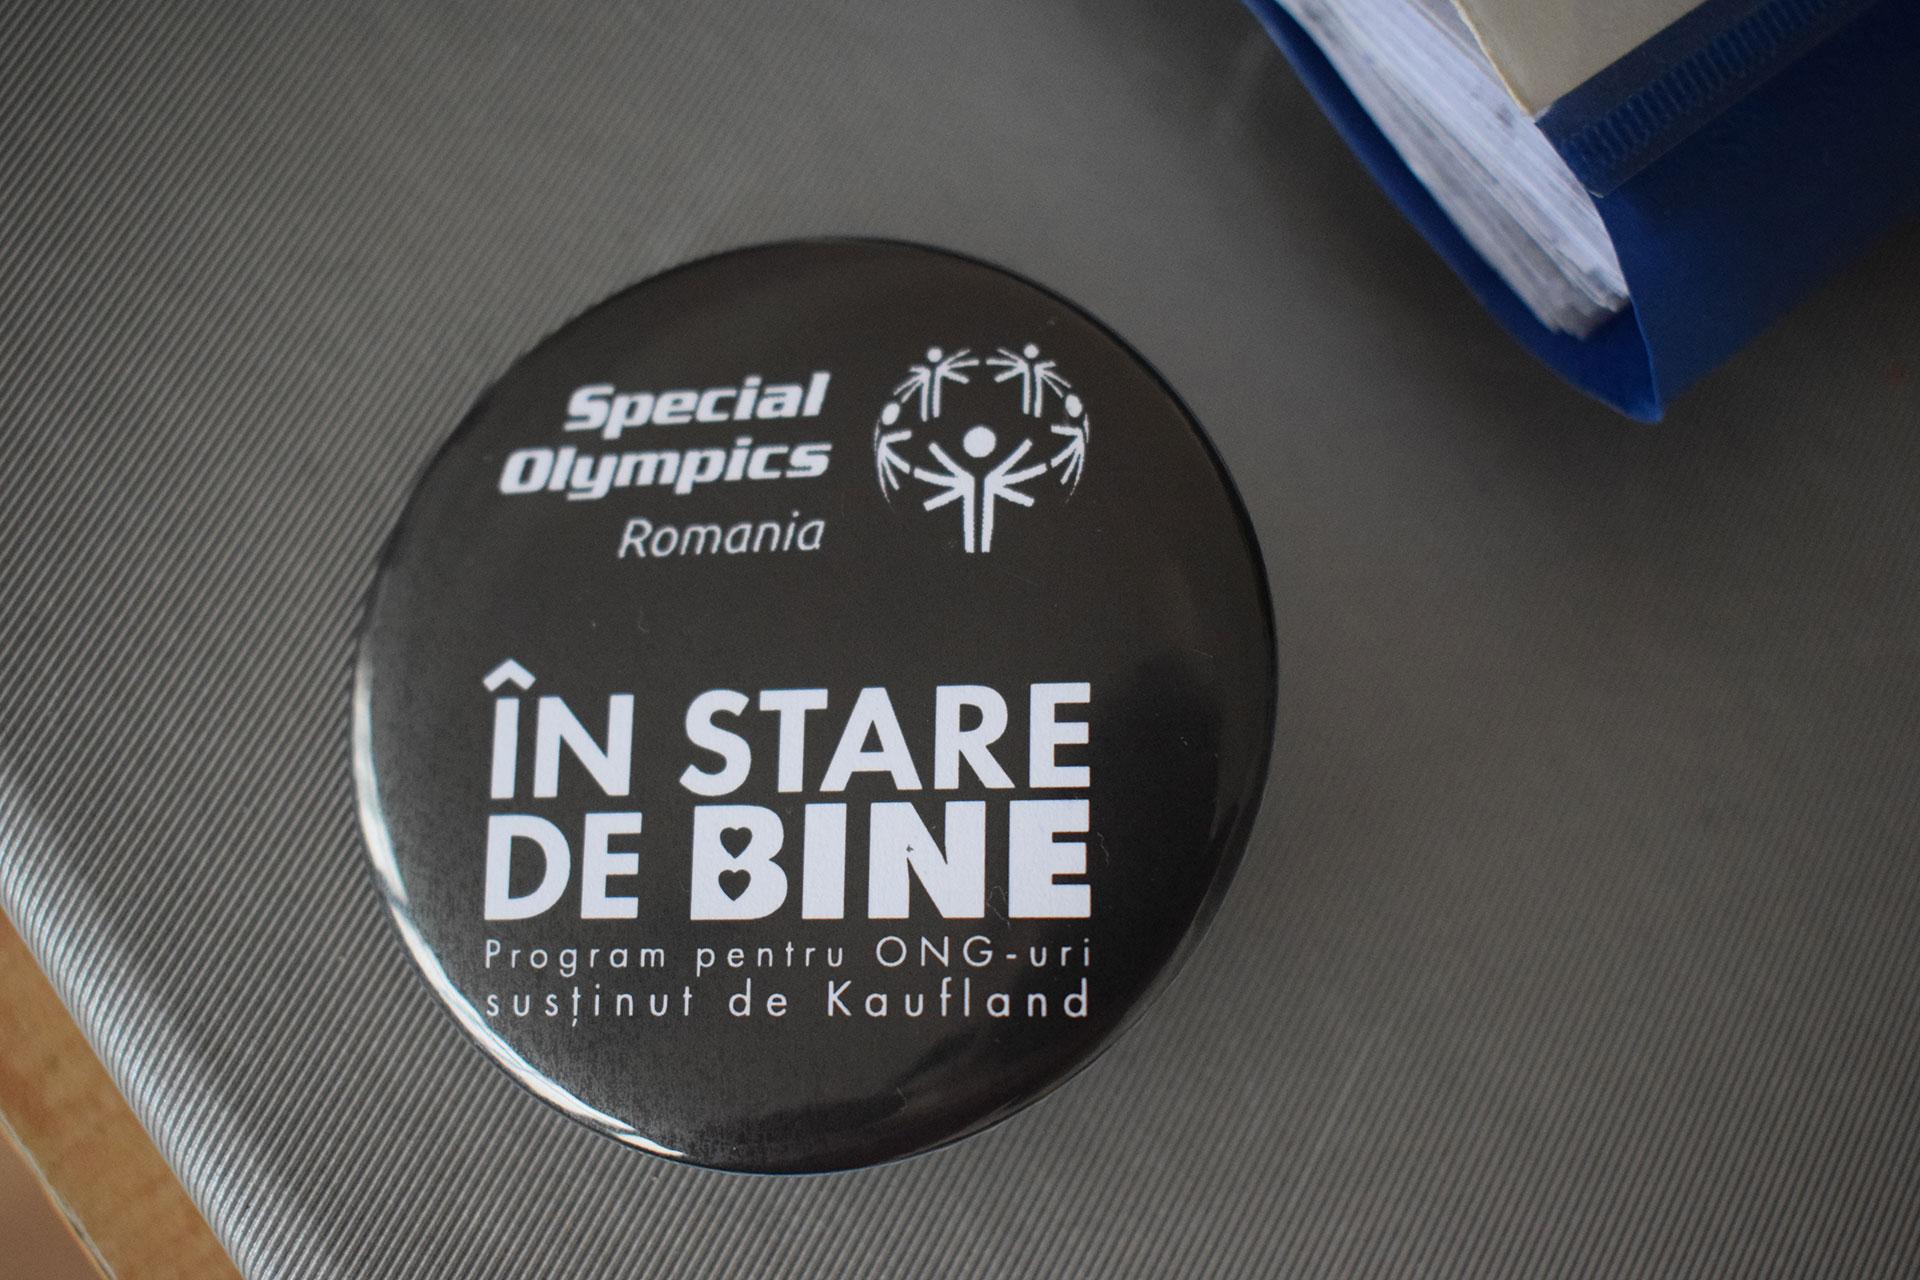 Special Olympics - in stare de bine